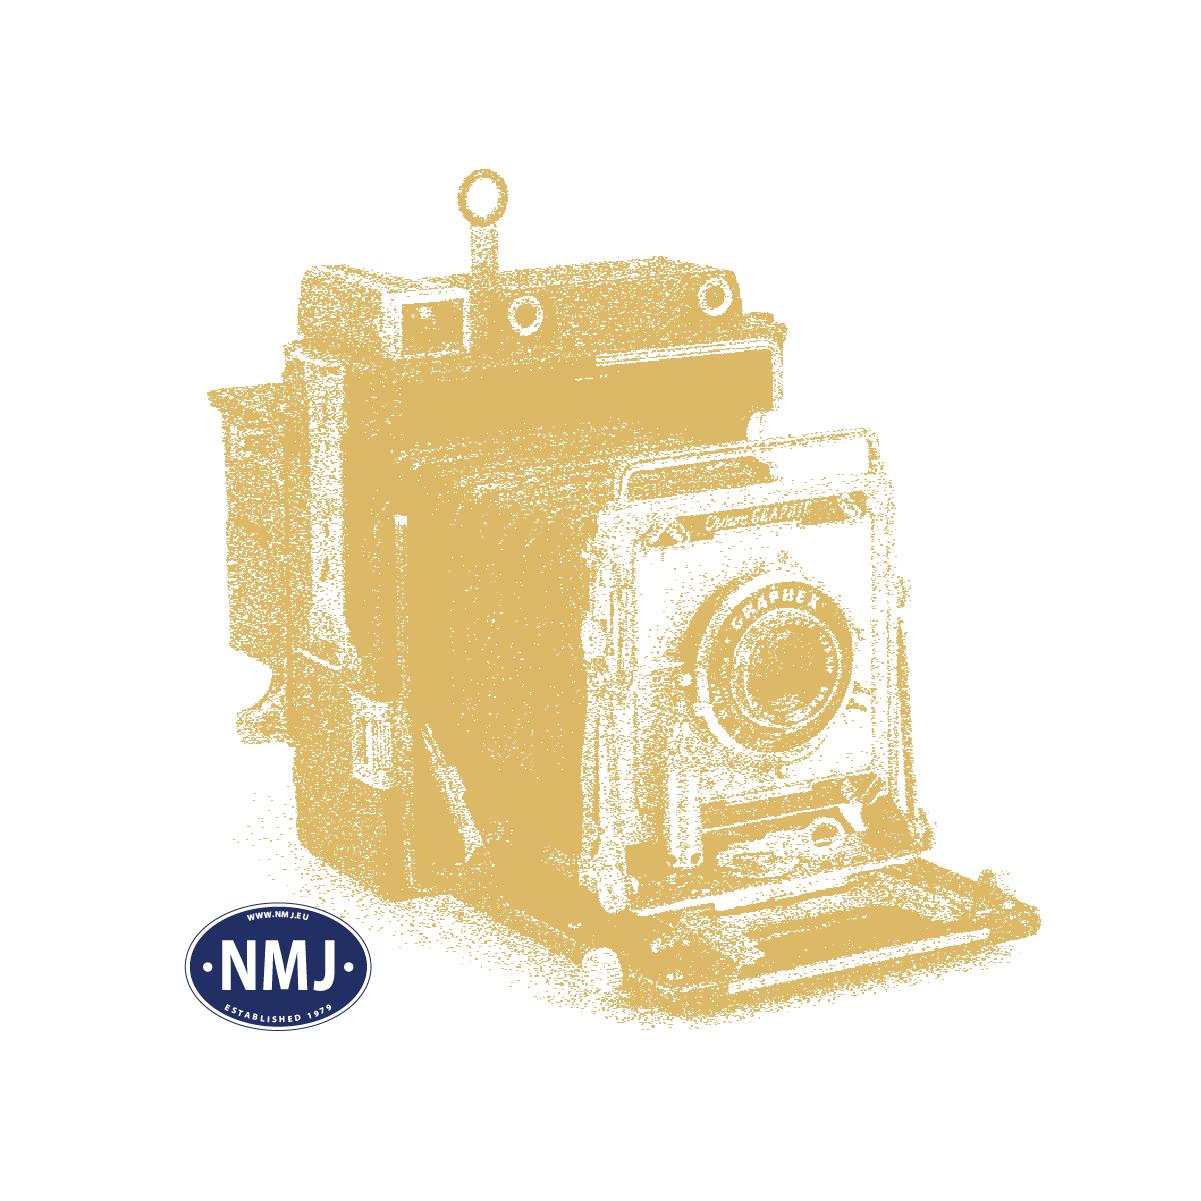 NMJ0G4-6 - NMJ Superline NSB Gbkls 20 76 158 5889-0, Spor 0